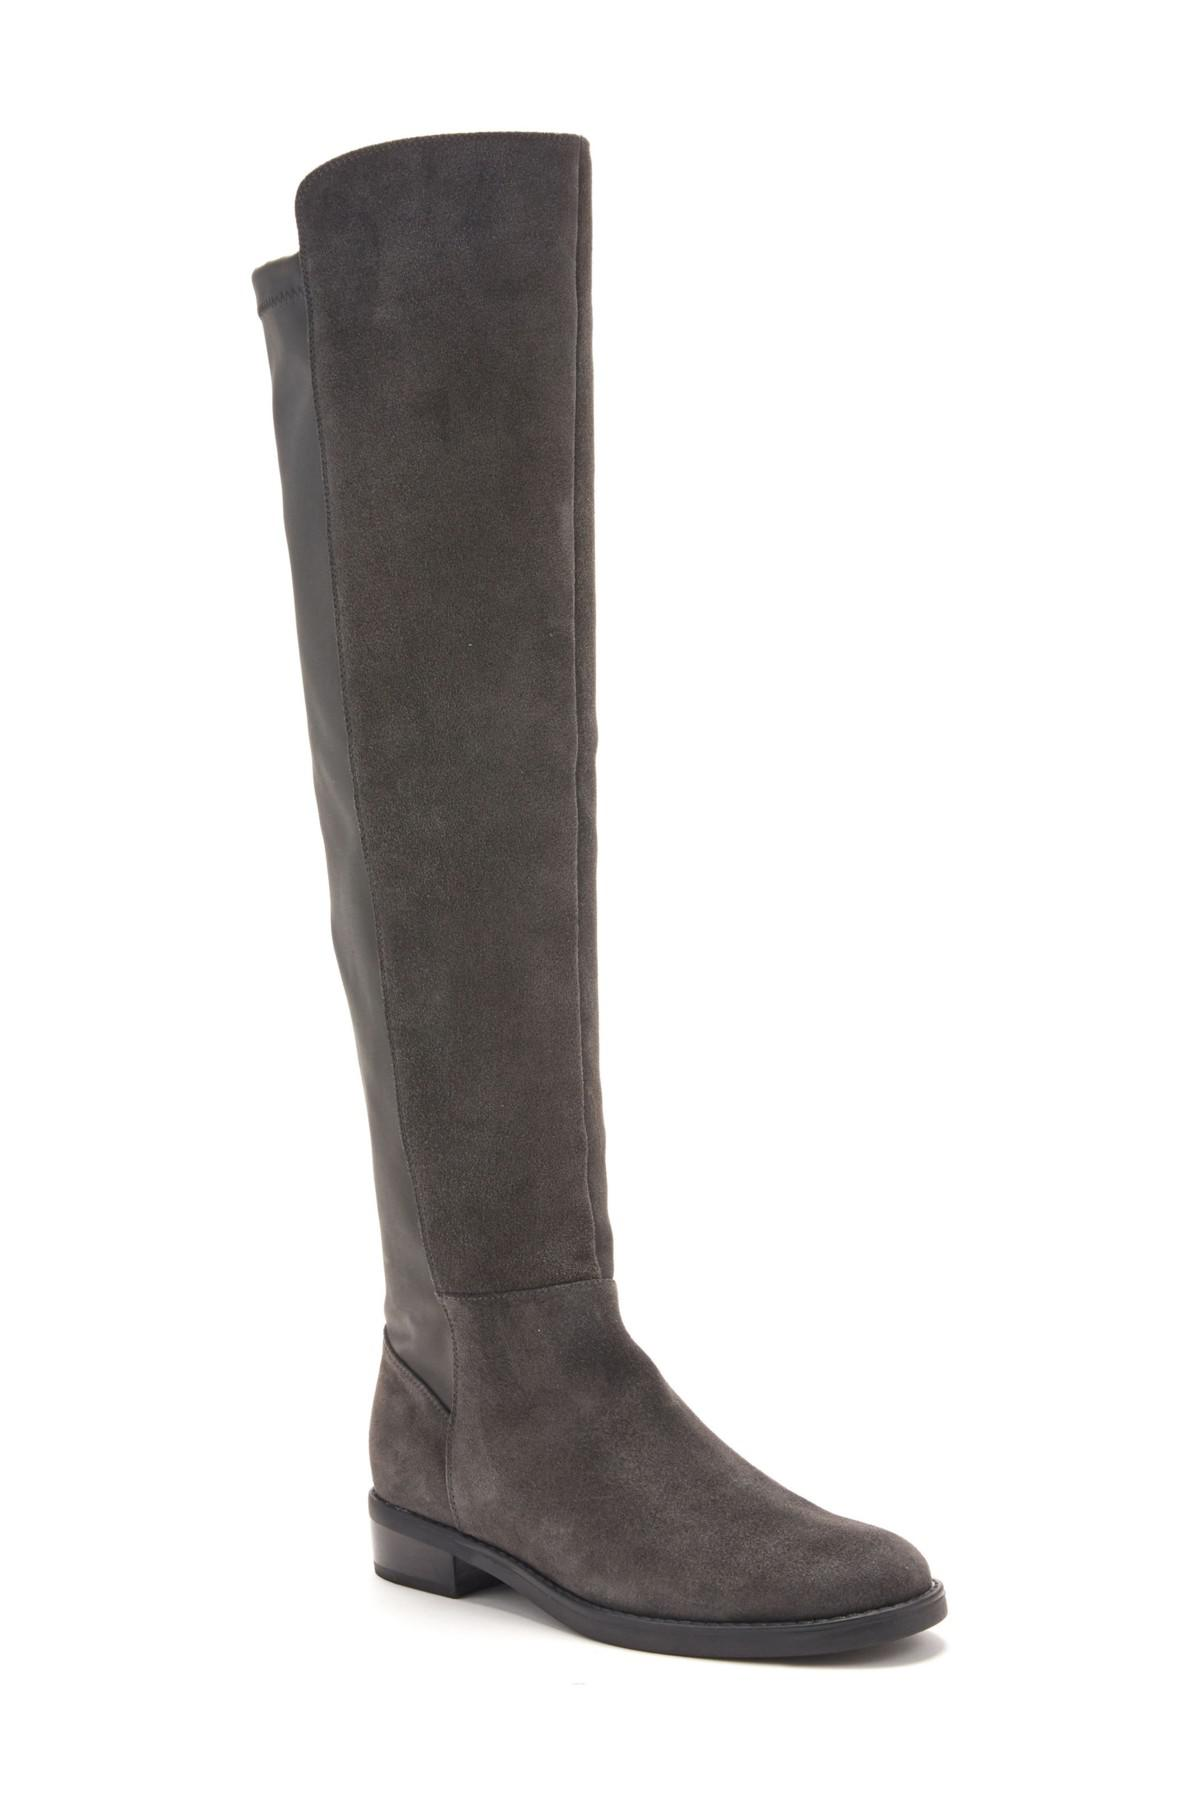 c97110bba69 Lyst - Blondo Olivia Knee High Boot in Gray